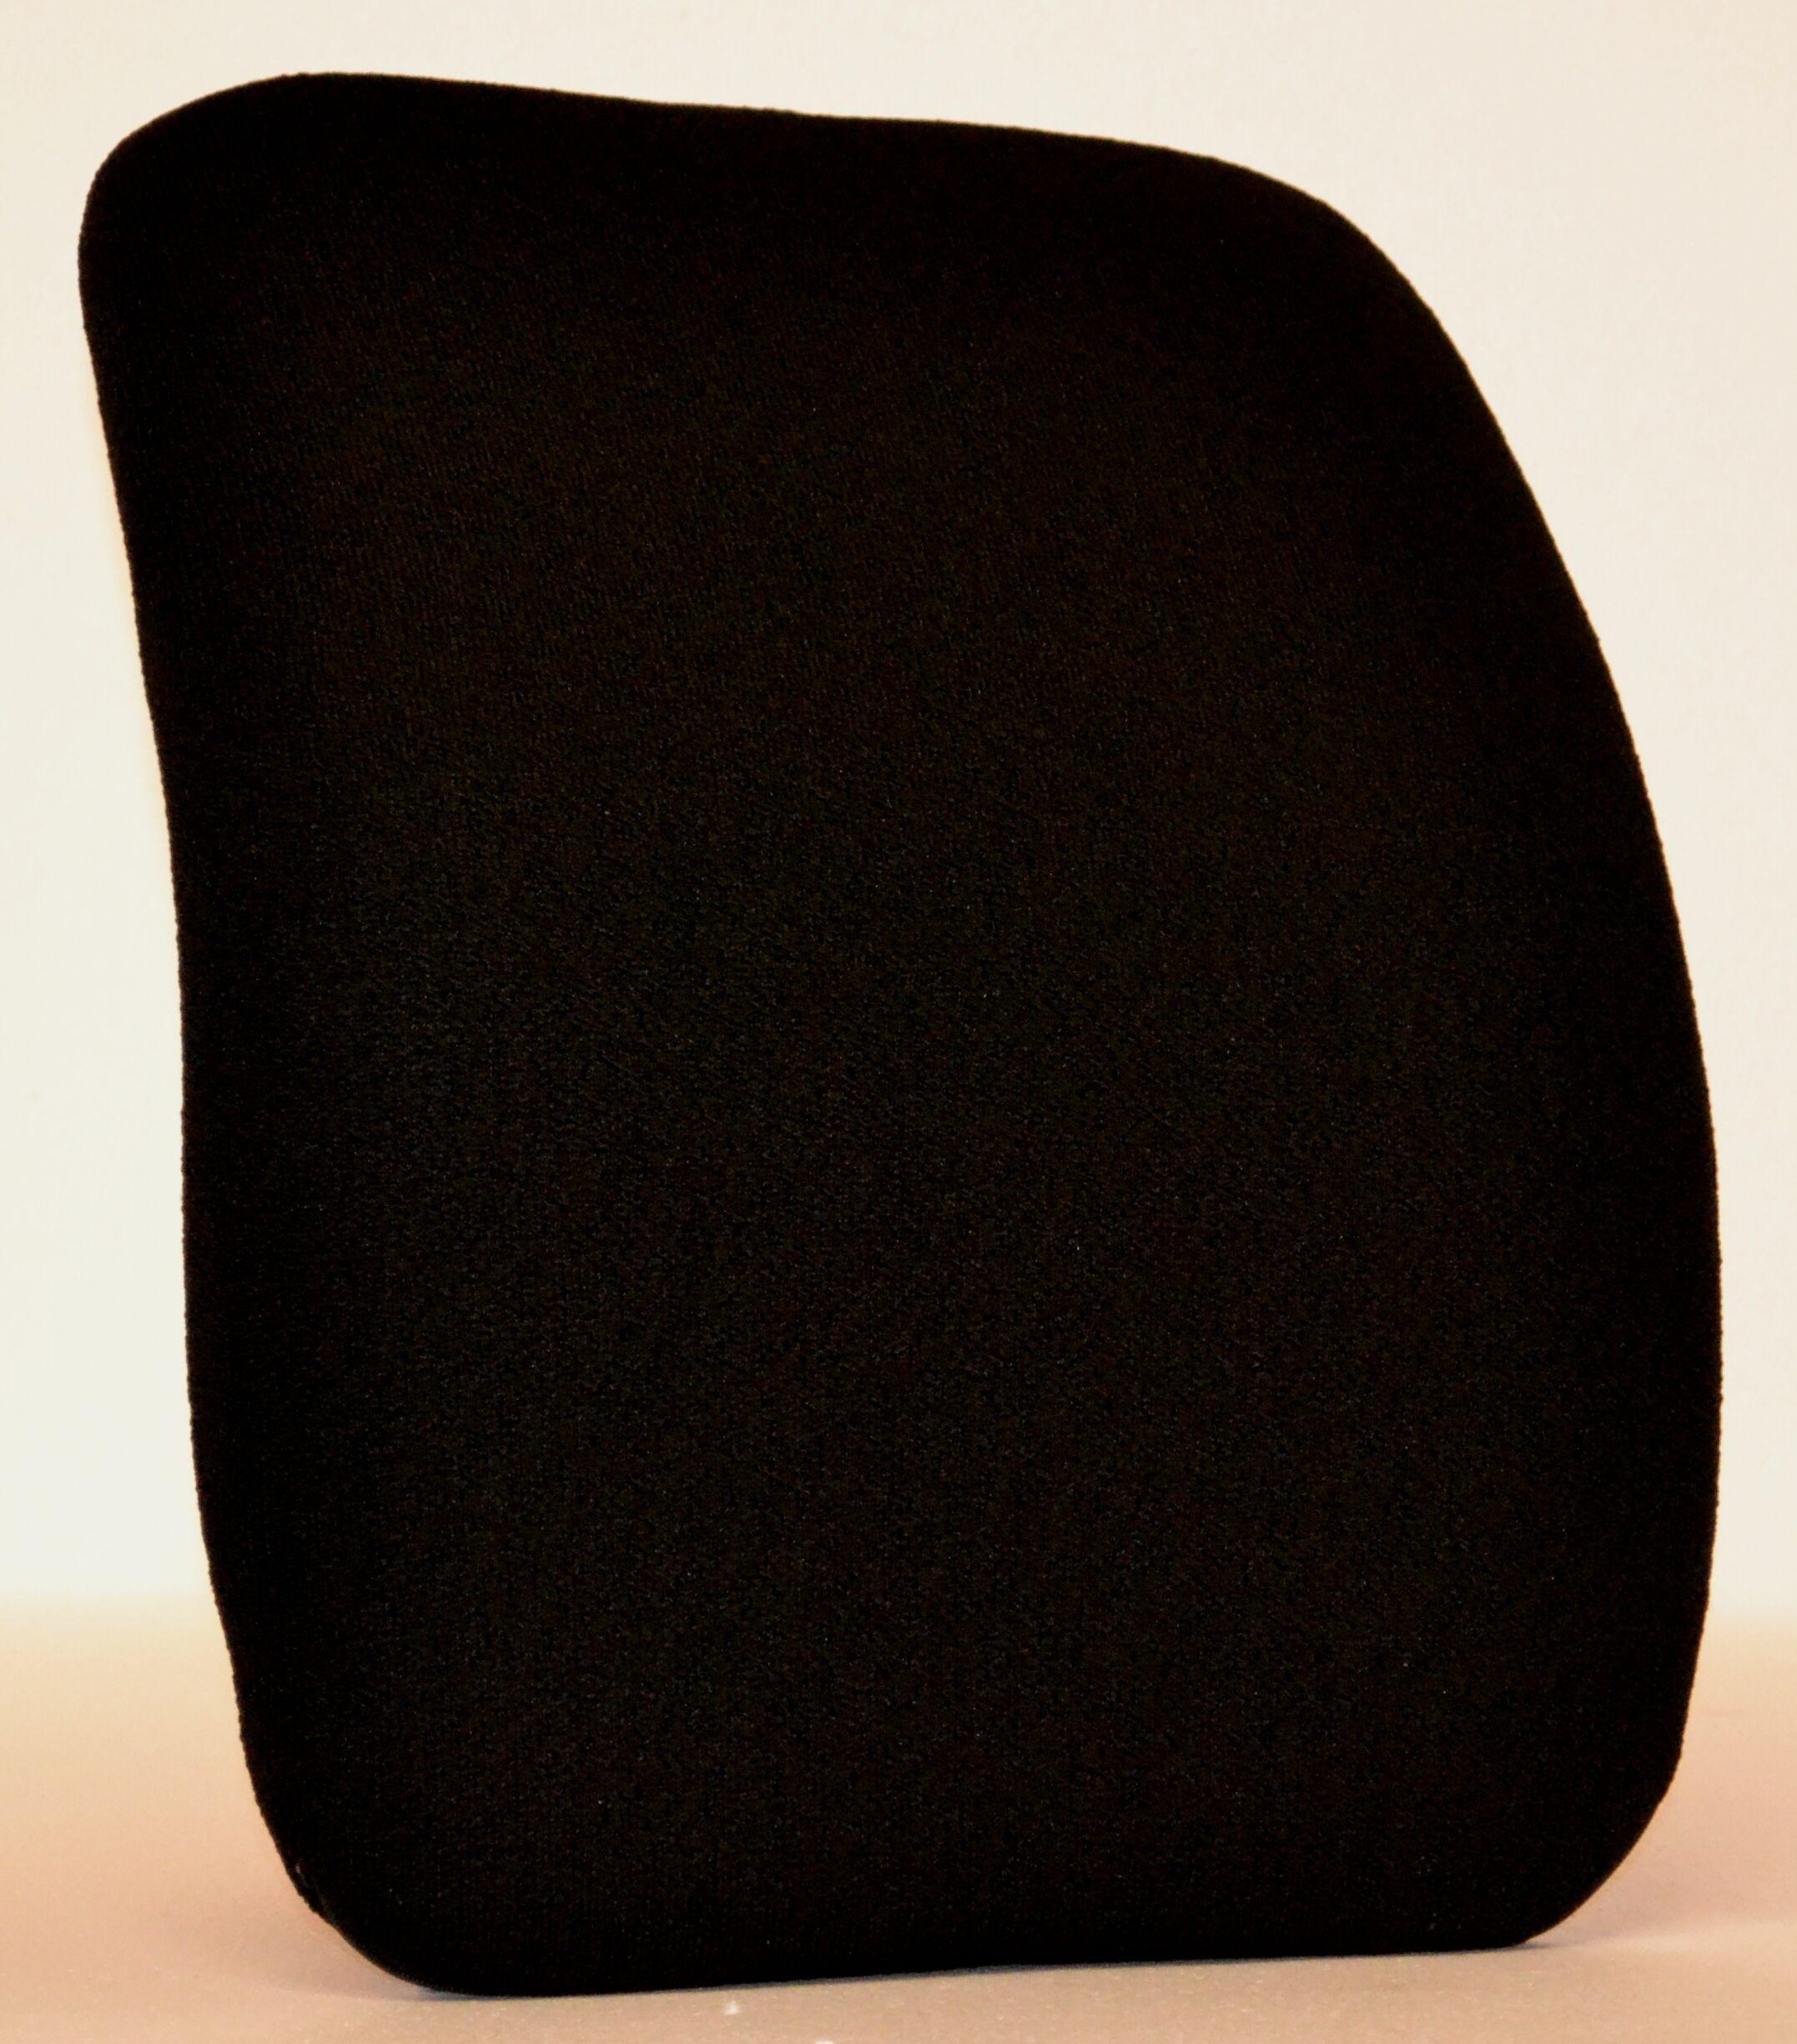 Keri Back Chair Cushion Color: Black